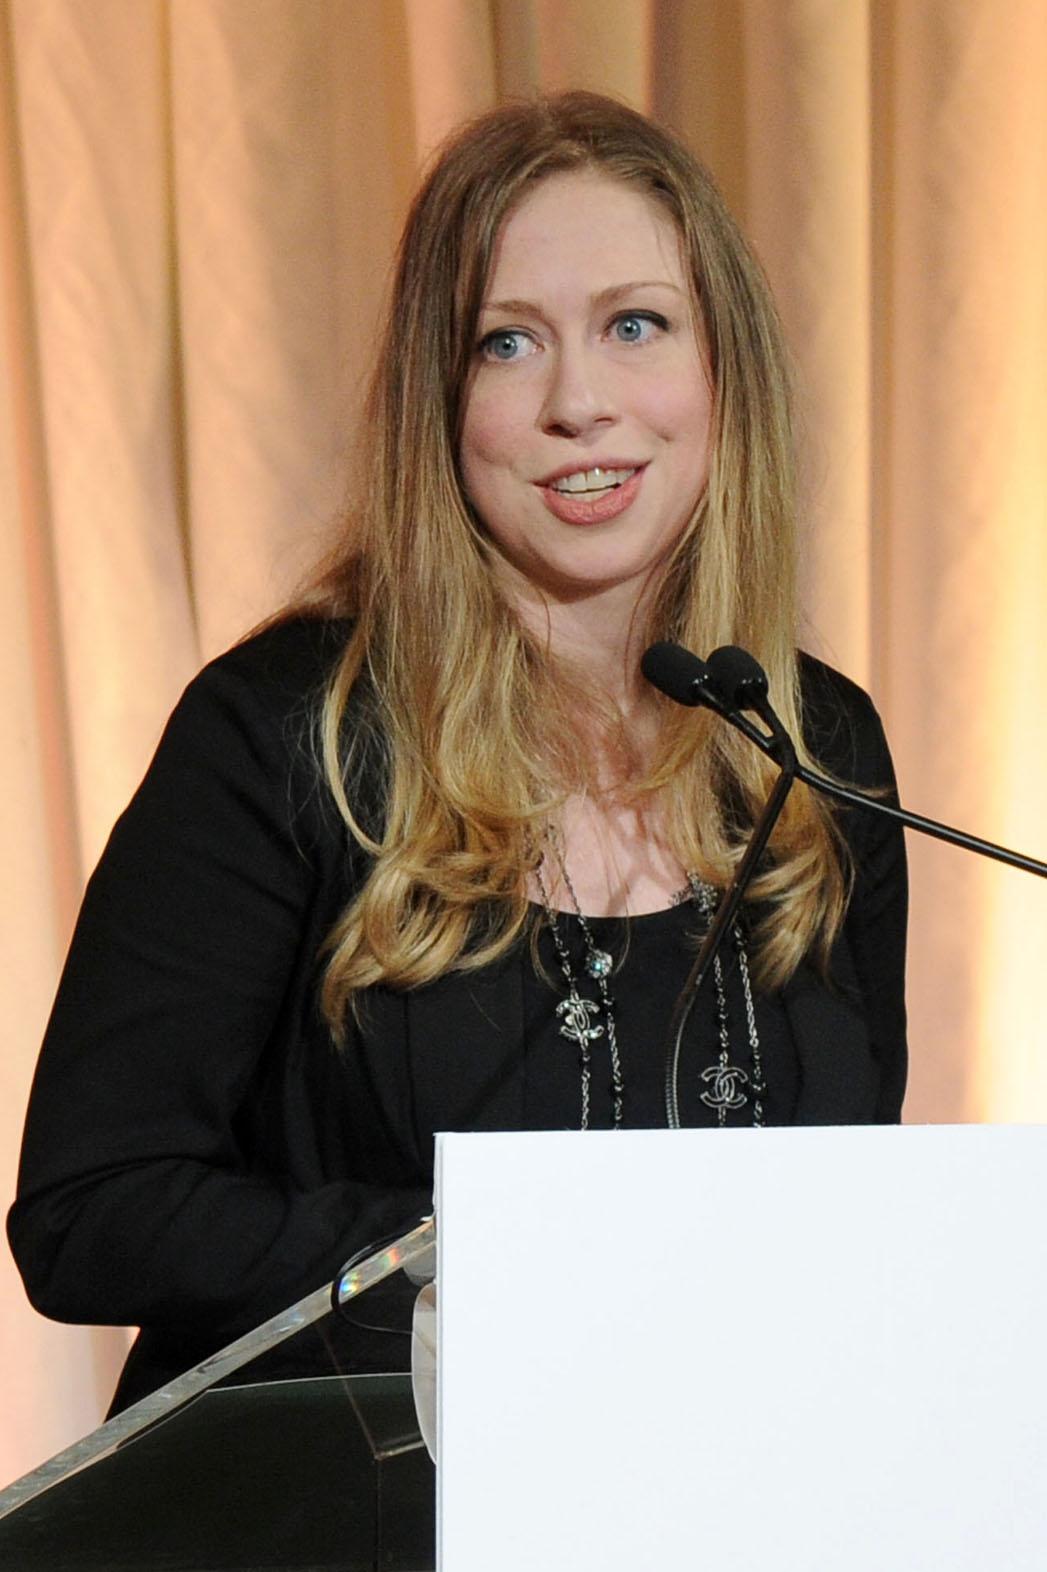 Chelsea Clinton Headshot - P 2014